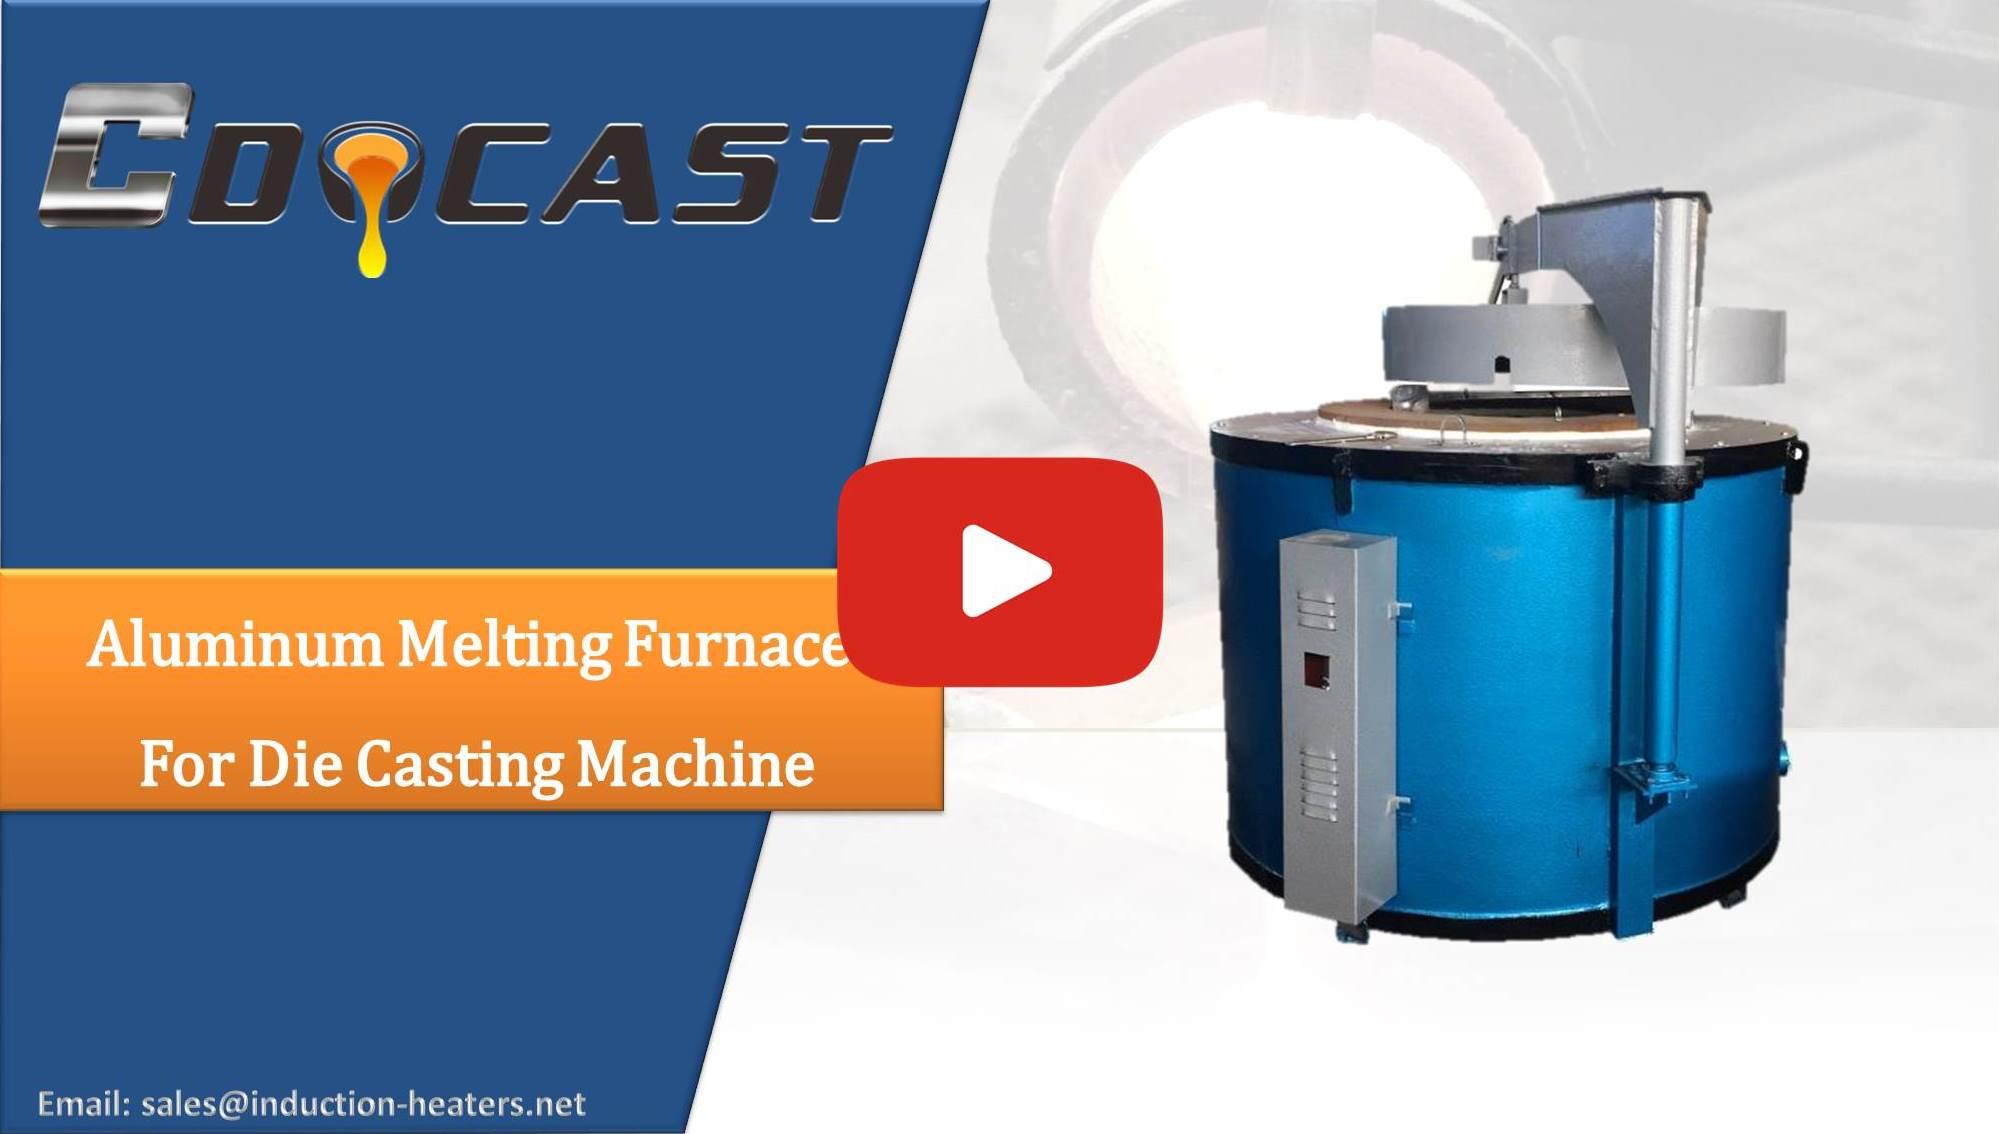 Aluminum Melting Furnace For Die Casting Machine